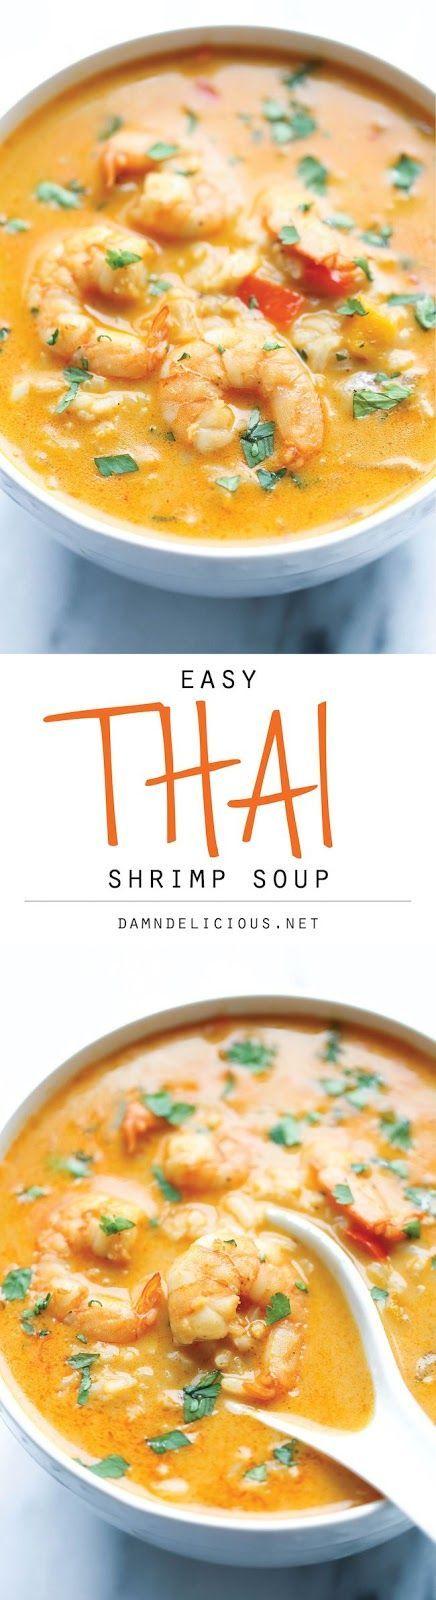 One Of The Best Recipes,Amazingly Tasty Thai Shrimp Soup | DIY Beauty Fashion